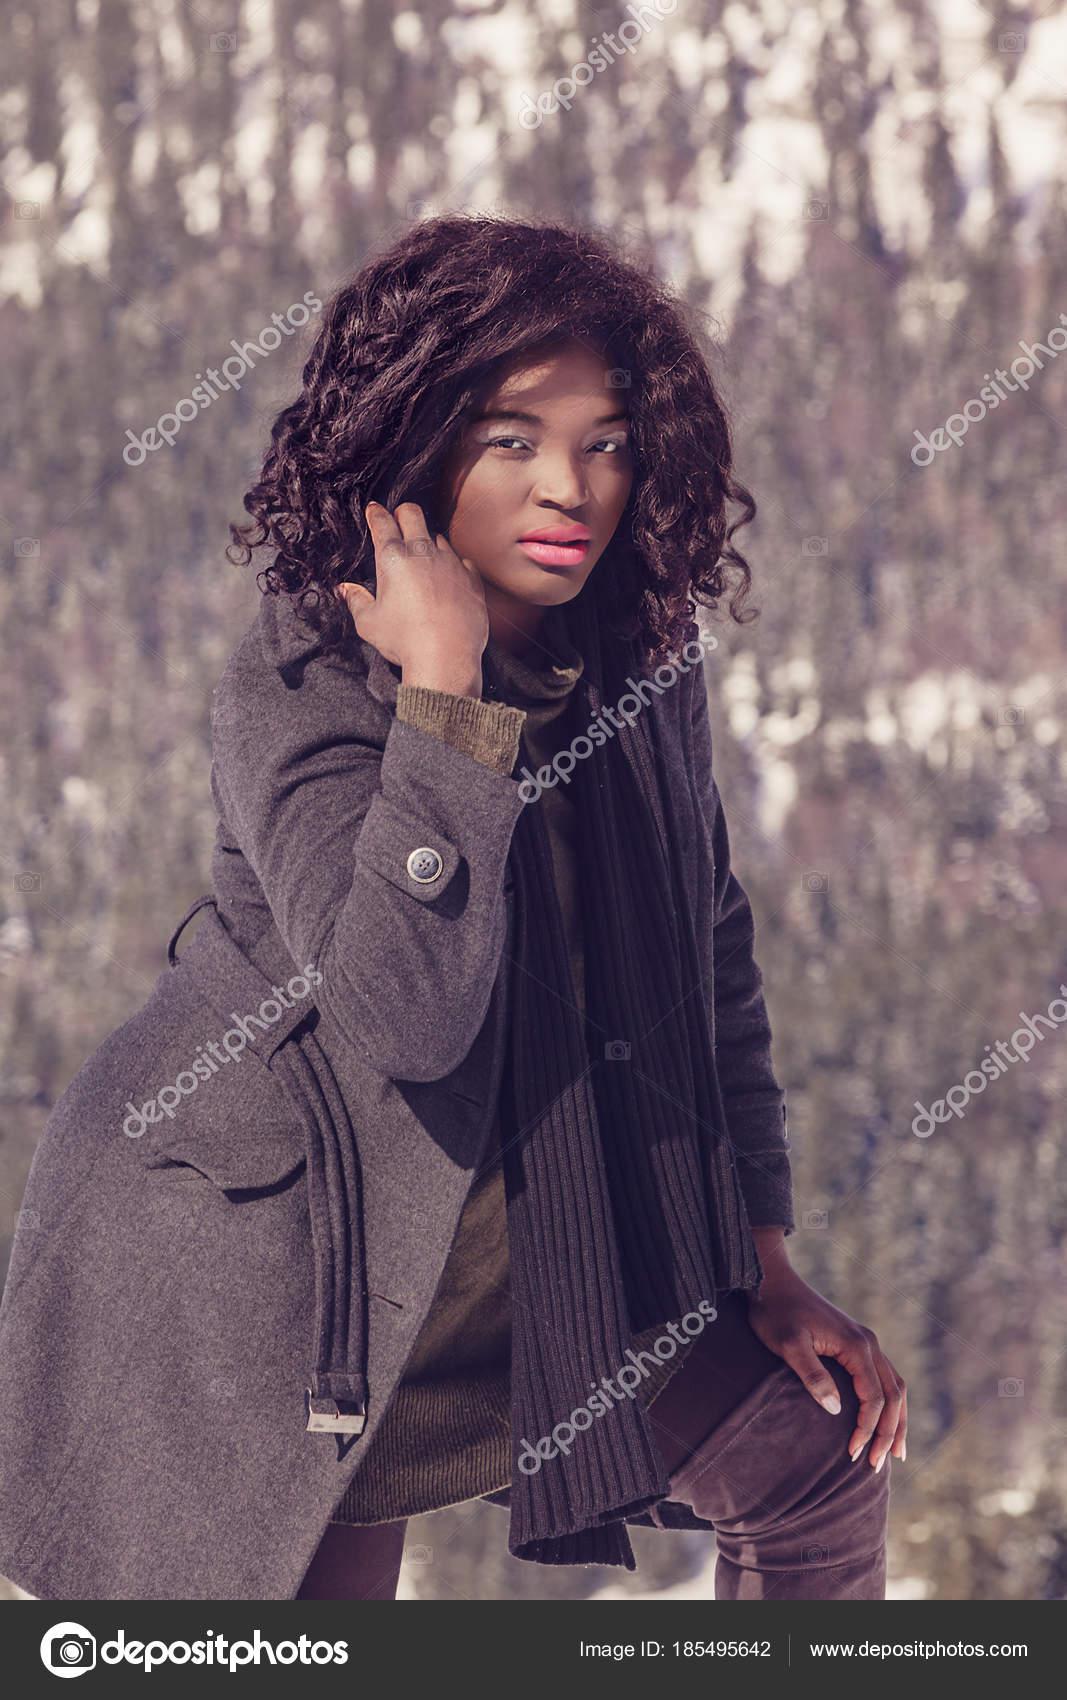 27bb5d79c2e7 Μαύρη Γυναίκα Υπερμεγέθης Μοντέρνα Χειμωνιάτικα Ρούχα — Φωτογραφία Αρχείου